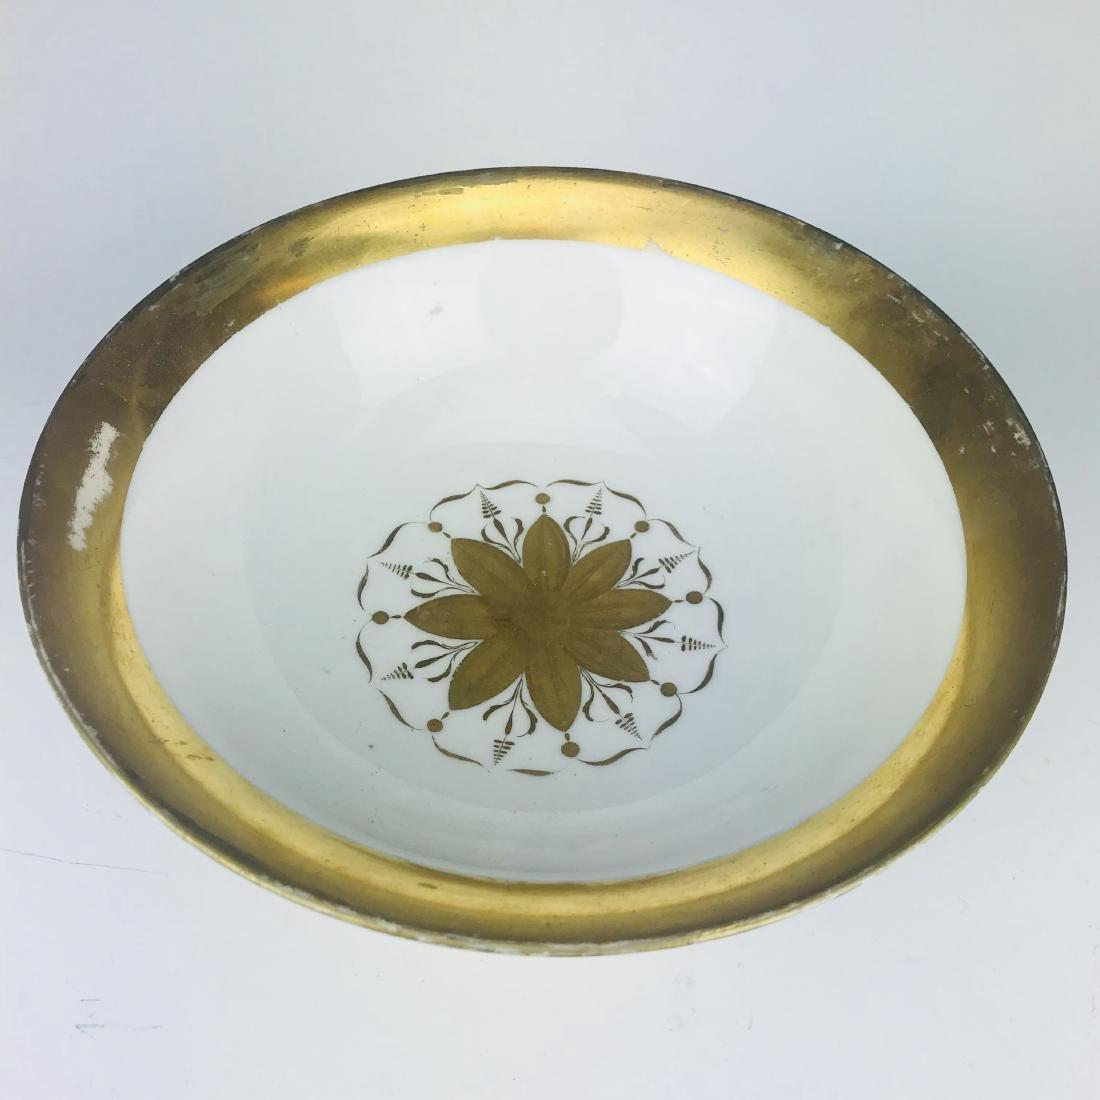 19th C. French Sevres Porcelain Centerpiece - 2